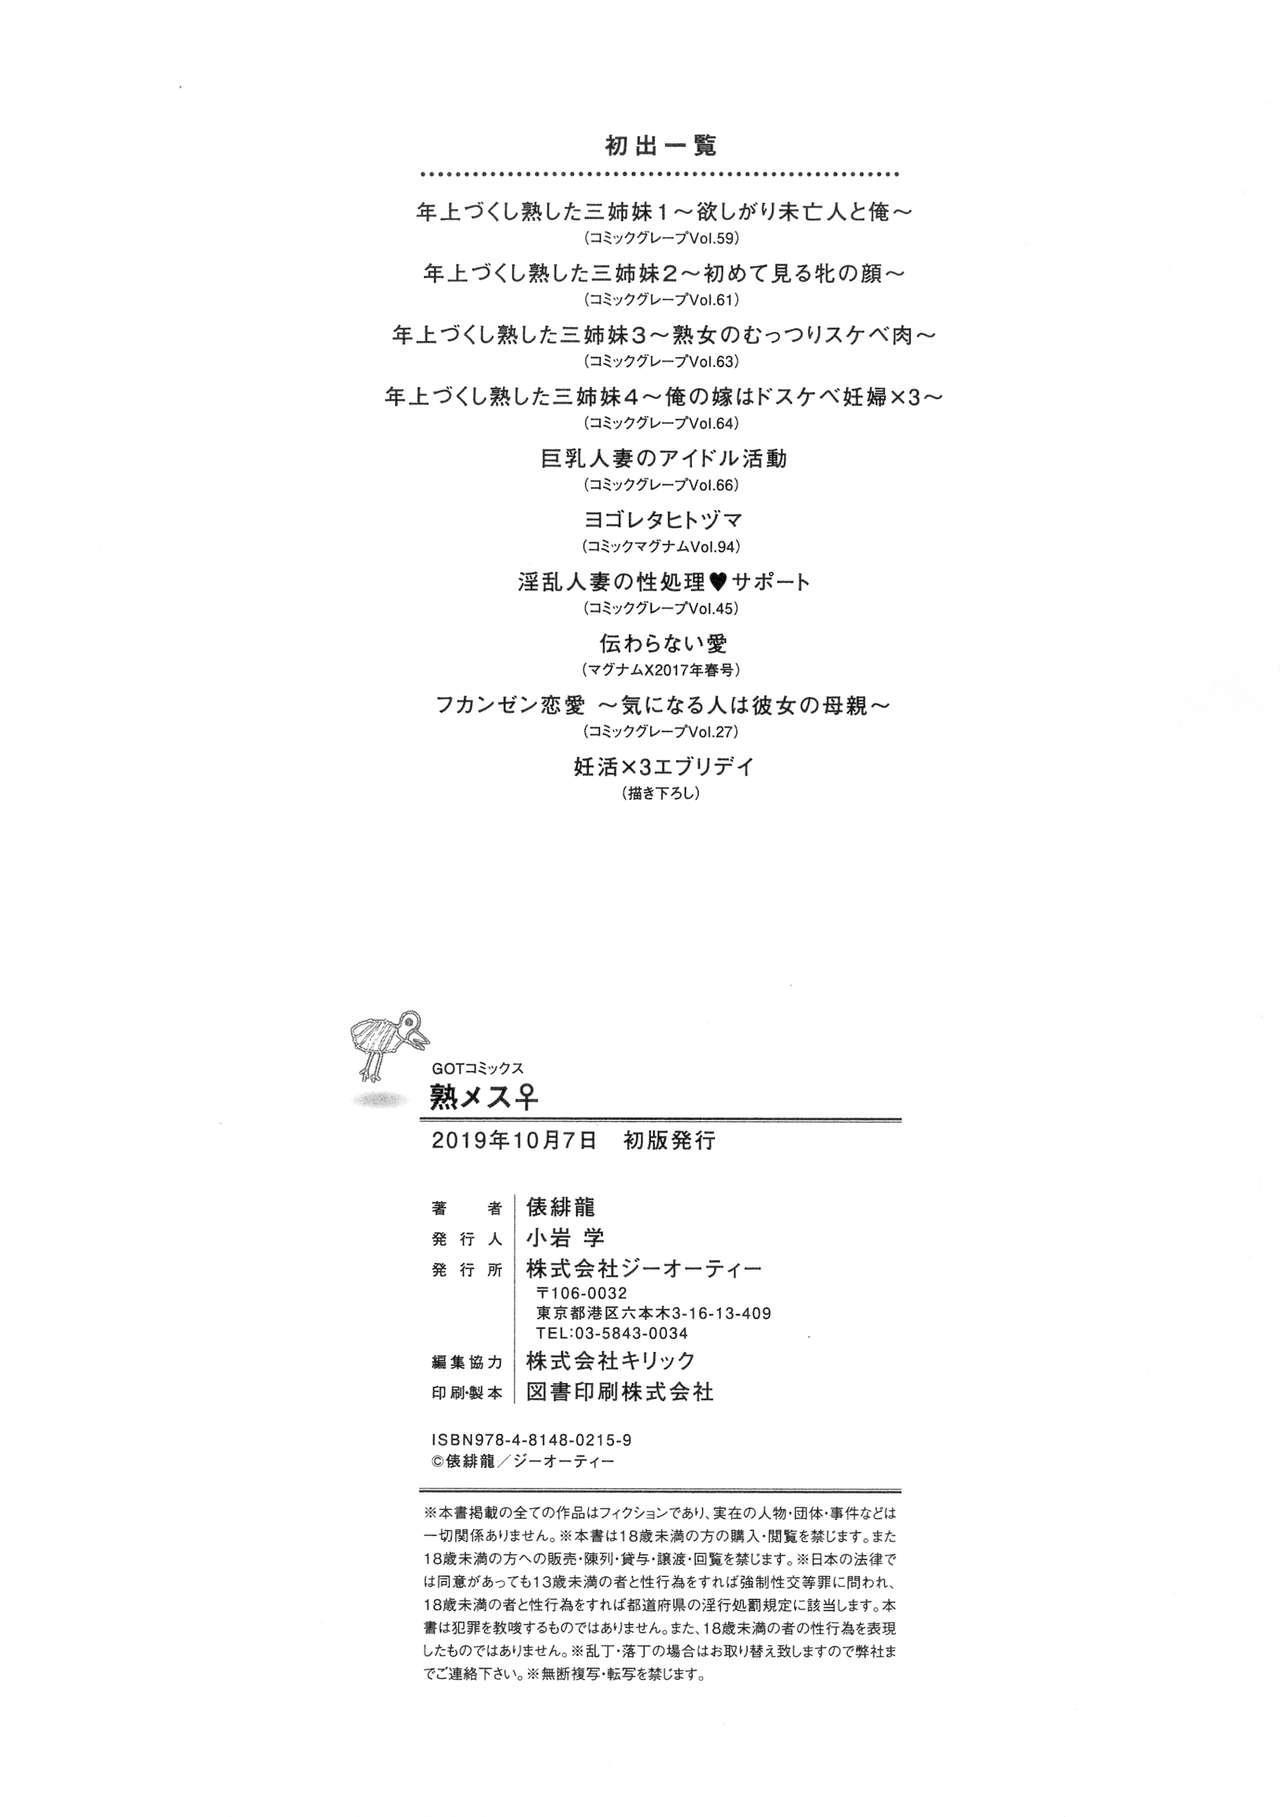 Juku Mesu - Erotic Mature Women 218